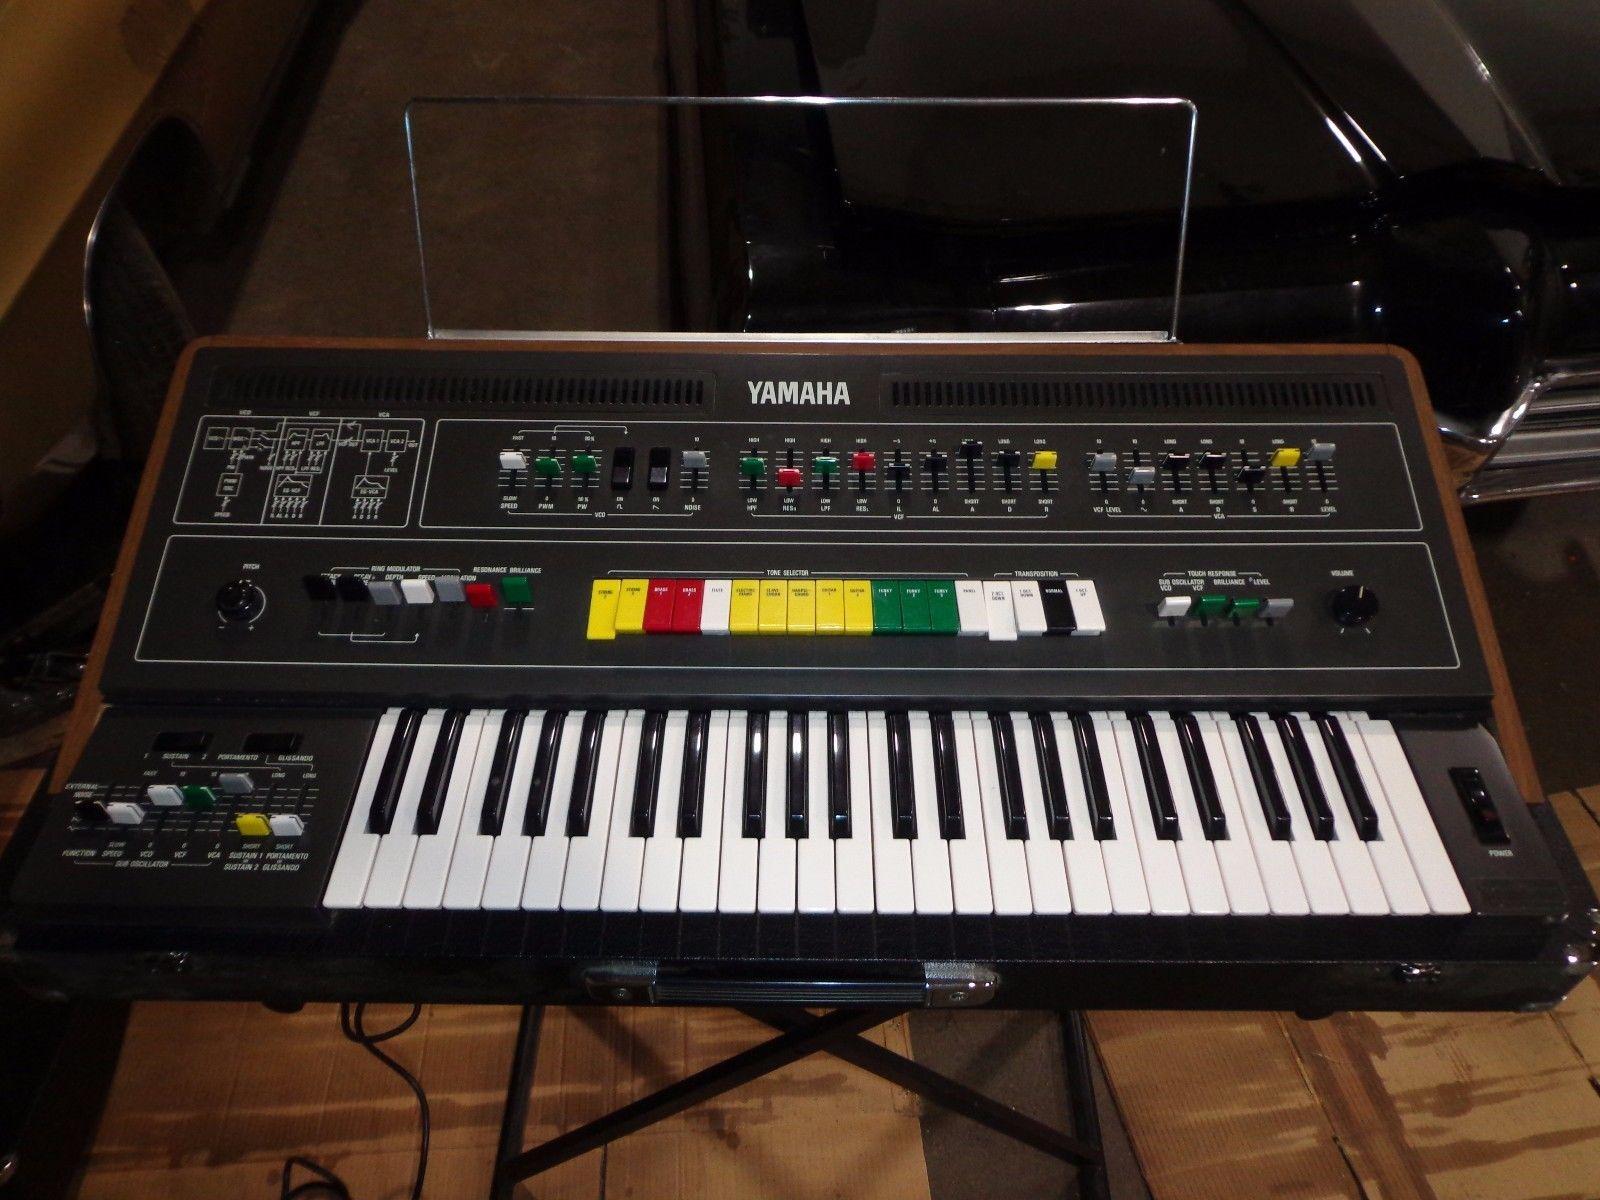 Matrixsynth vintage yamaha cs 50 synthesizer keyboard for Yamaha keyboard synthesizer